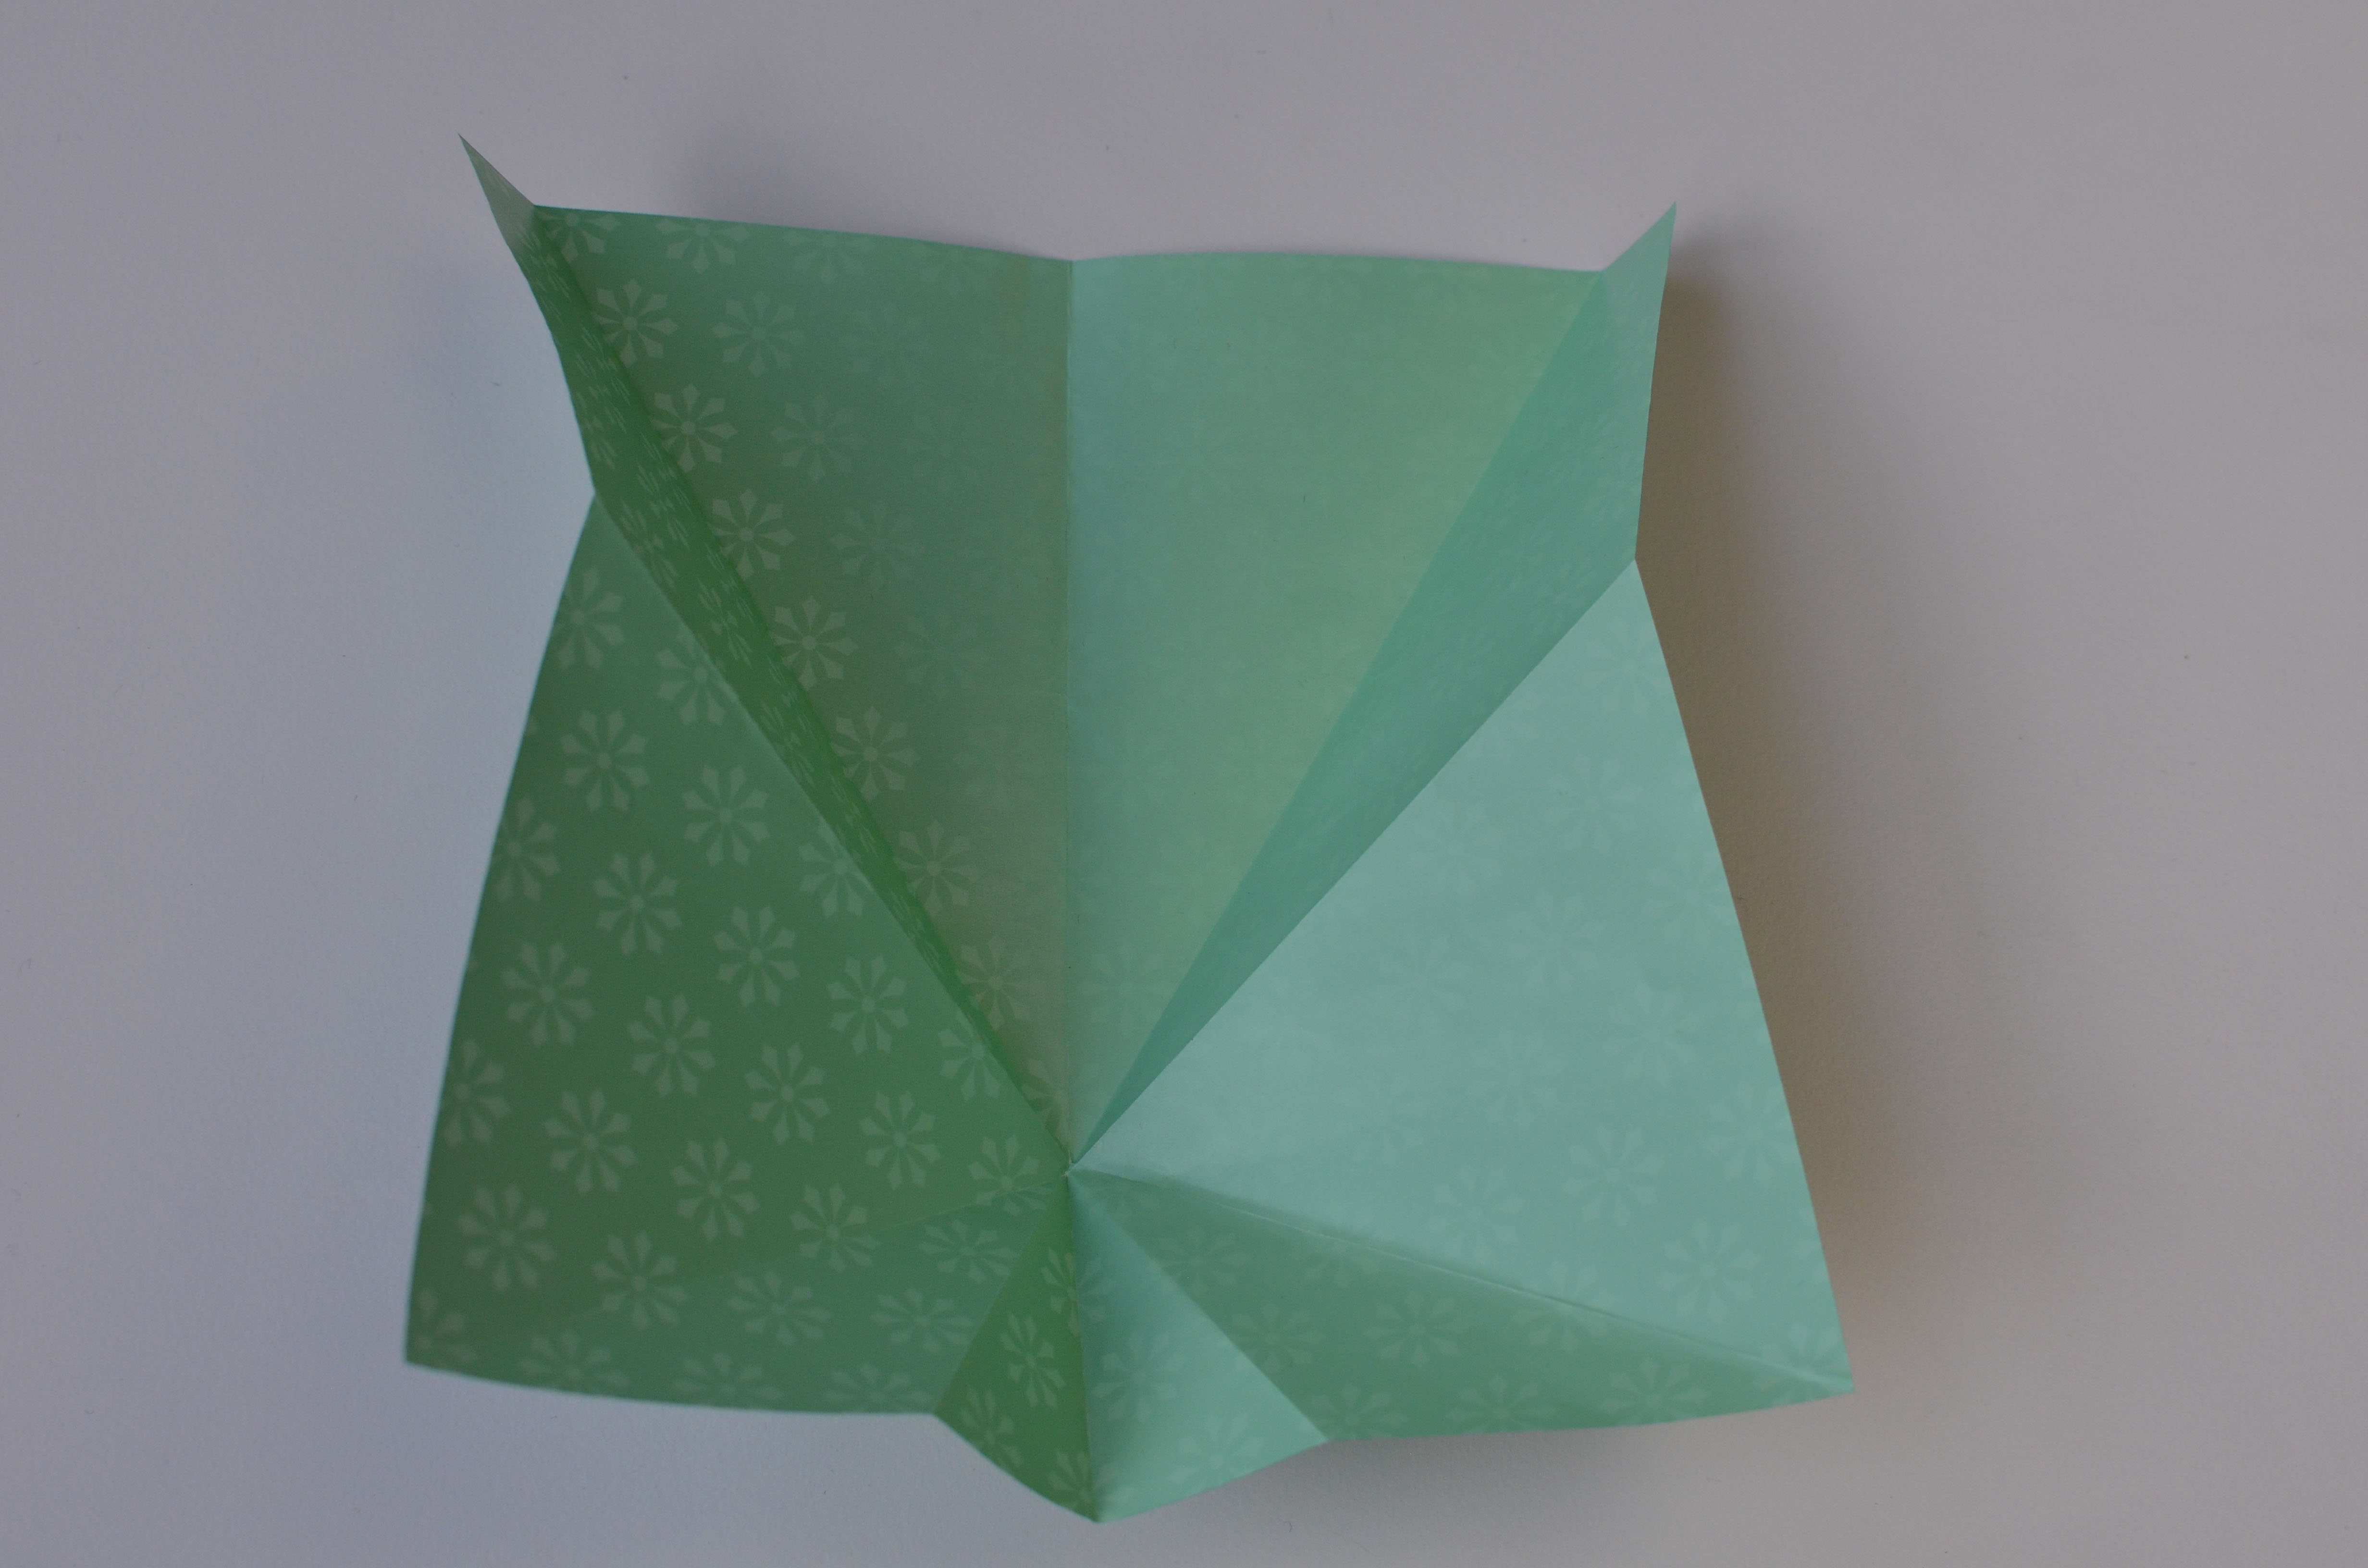 braincrafts_frog_origami_pt15.jpg